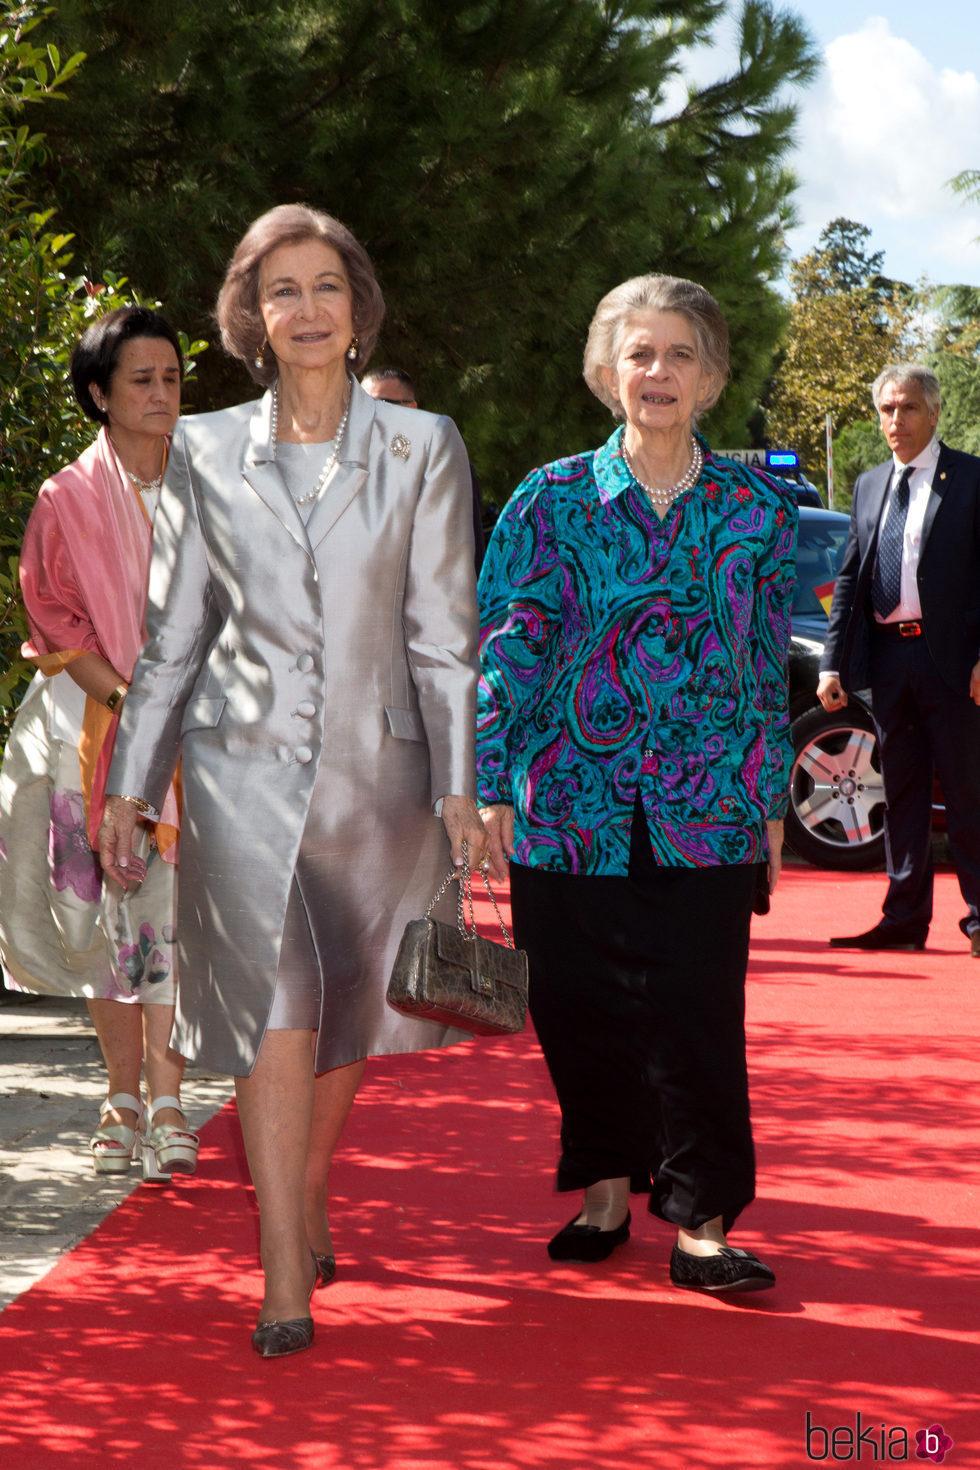 La Reina Sofa e Irene de Grecia en la boda de Leka de